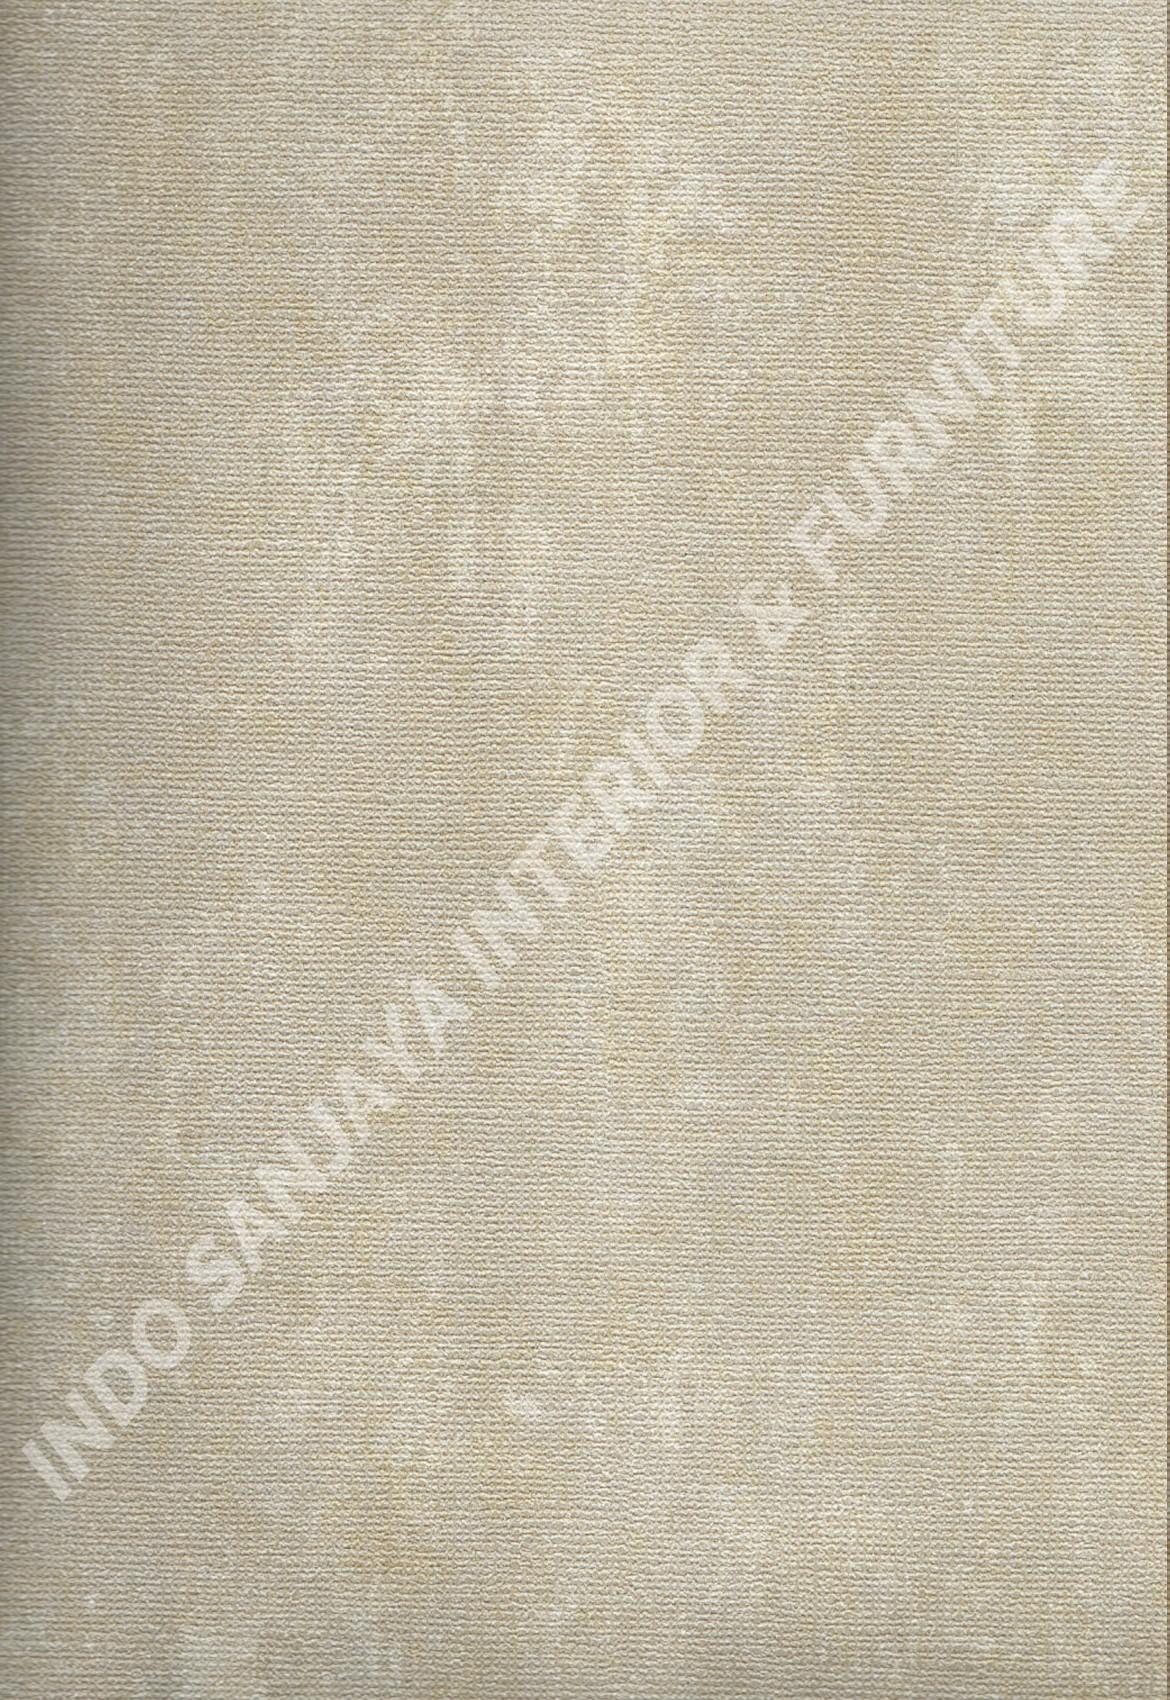 wallpaper   Wallpaper Minimalis Polos DL13205:DL13205 corak  warna